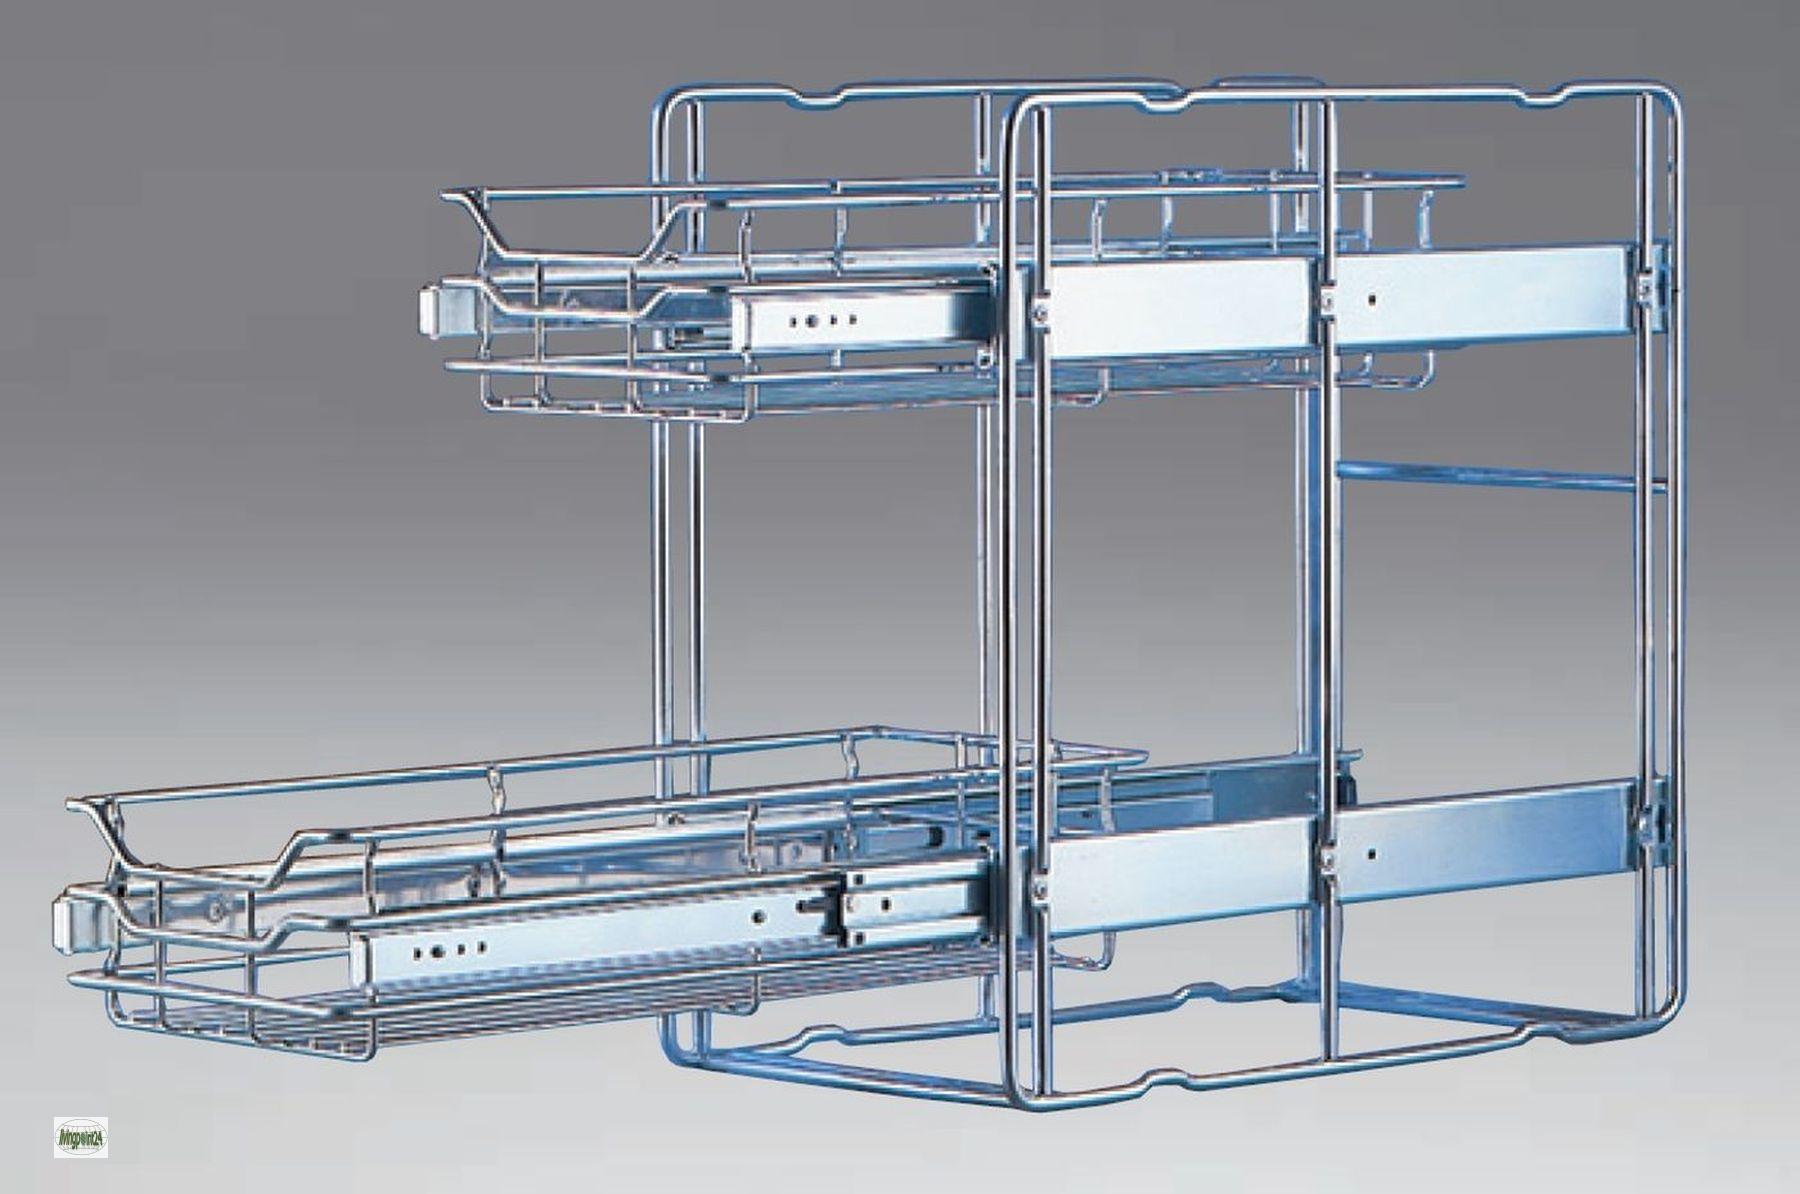 wesco quickbasket 60 er k chenschrank auszug schrankauszug. Black Bedroom Furniture Sets. Home Design Ideas